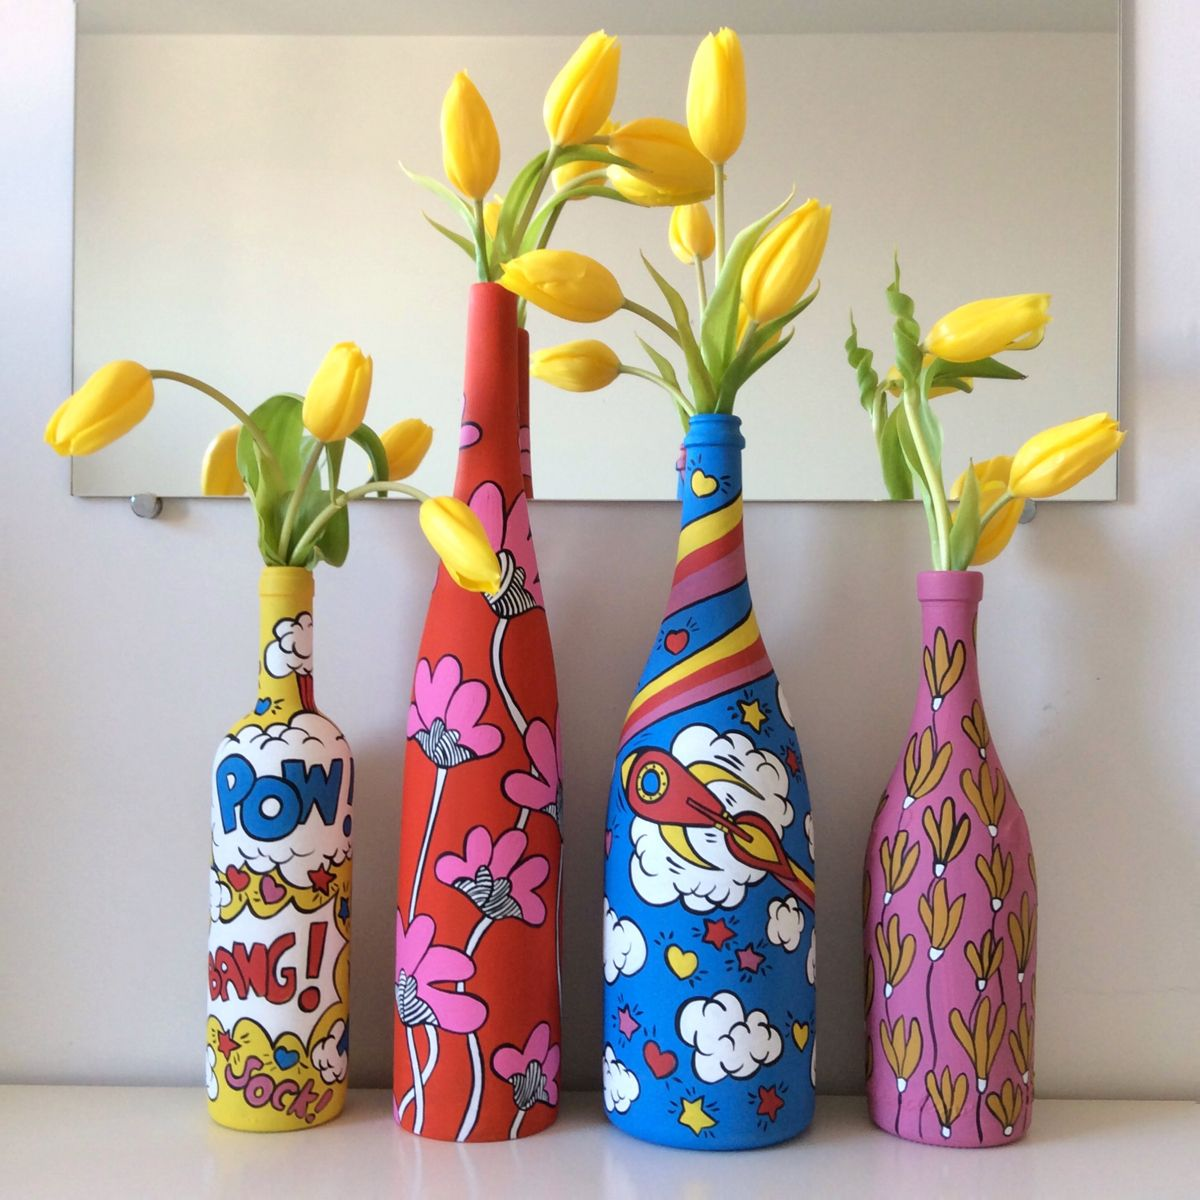 Bottiglie dipinte   Bottiglie dipinte, Disegni pittura su ...